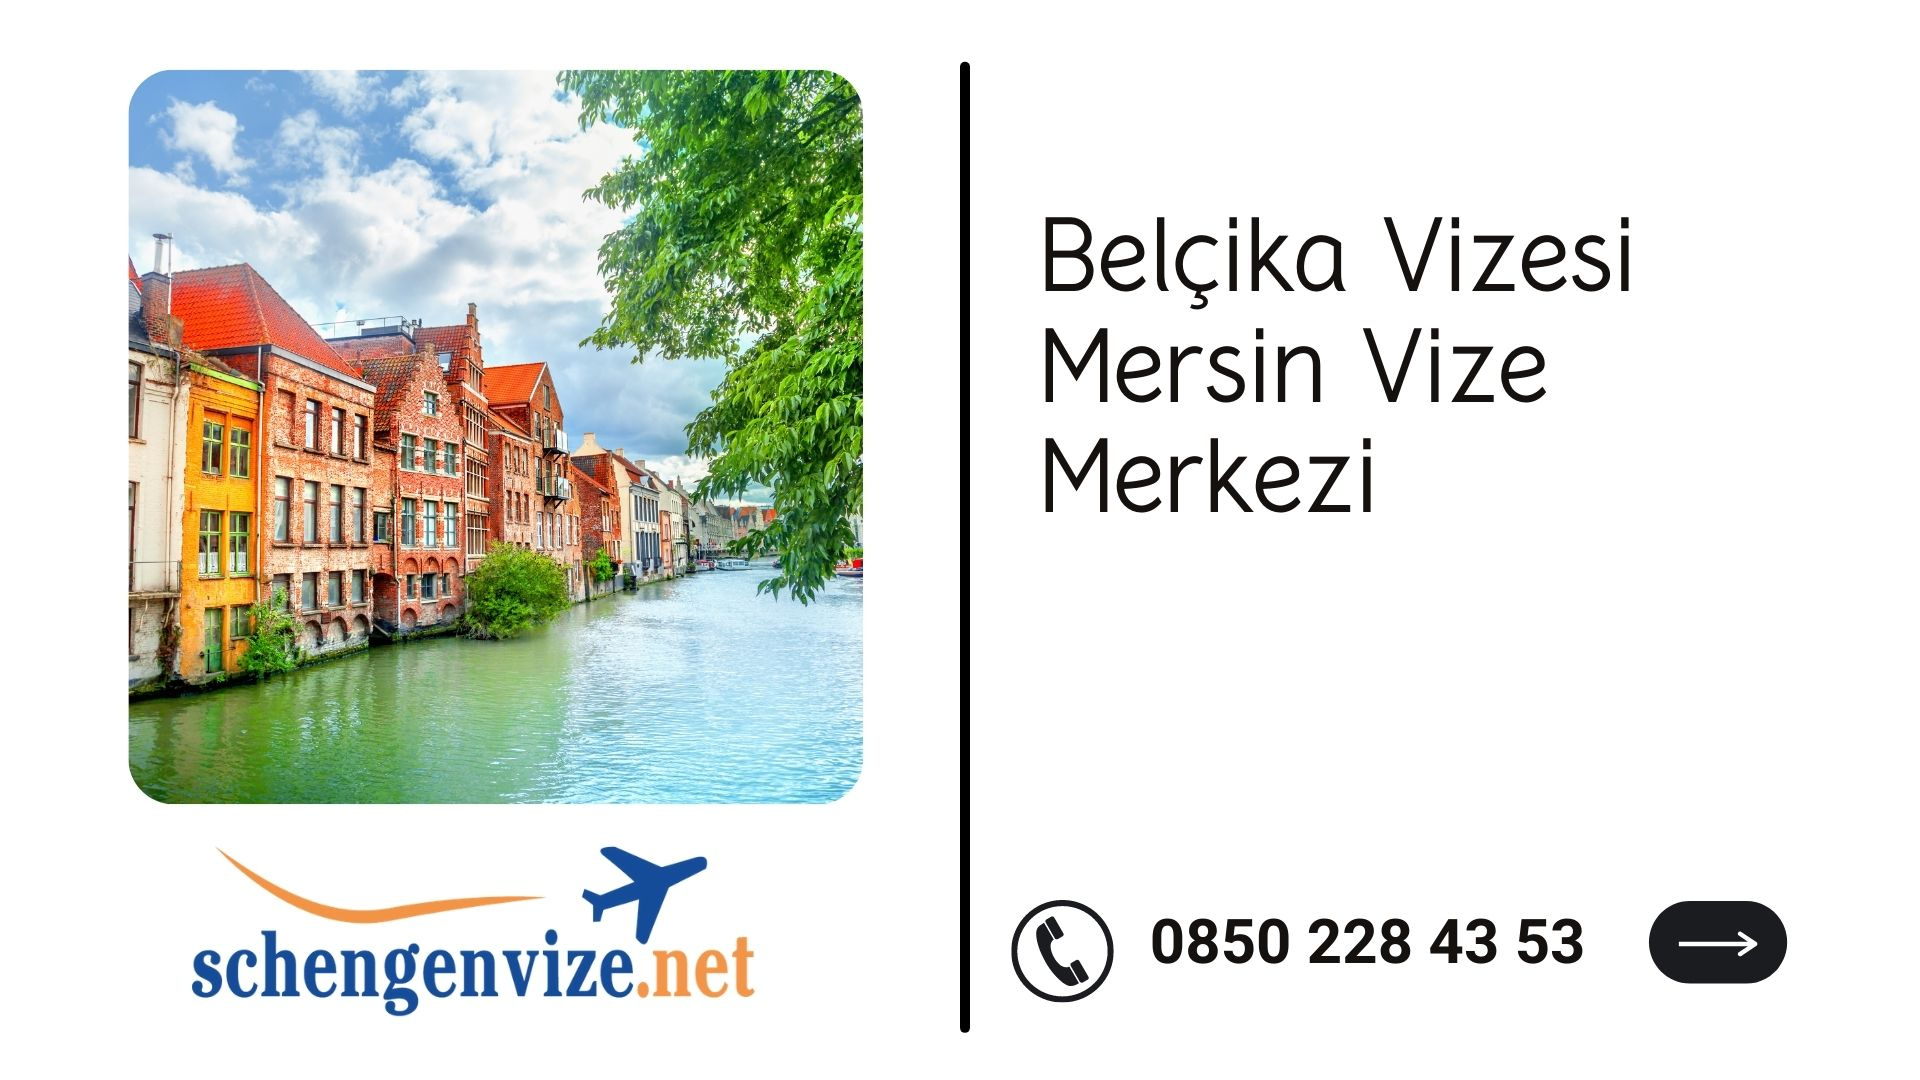 Belçika Vizesi Mersin Vize Merkezi